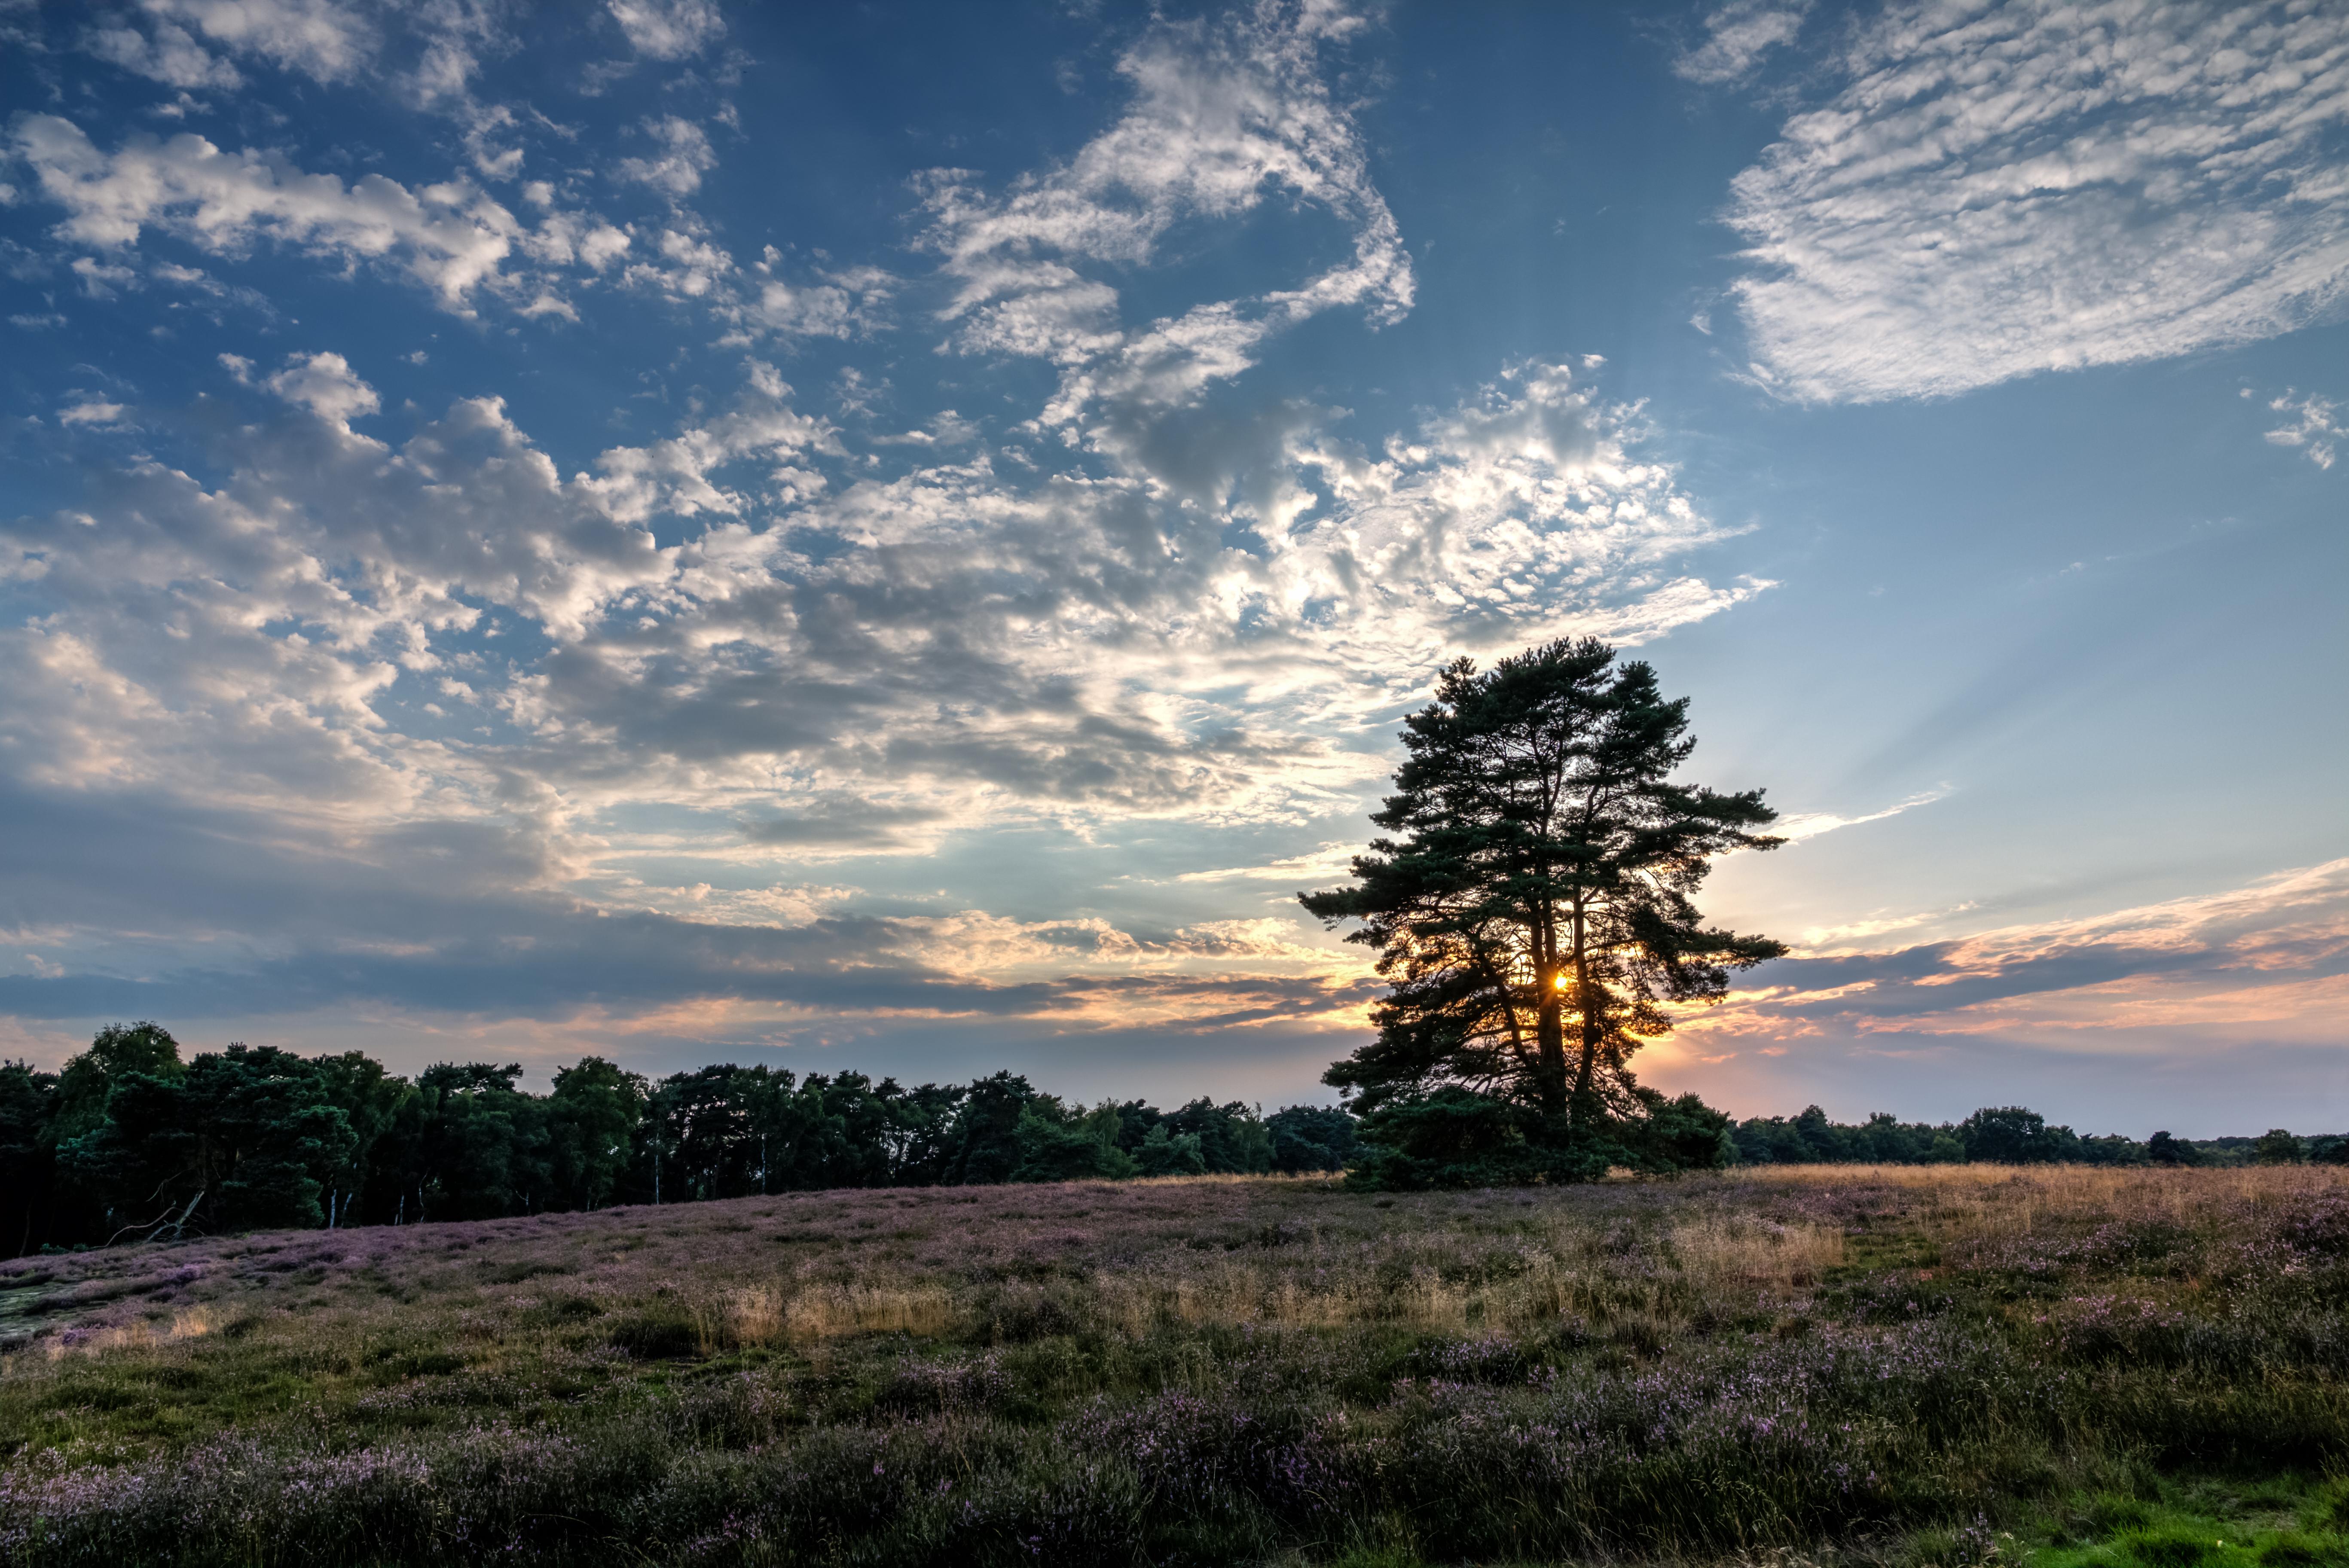 File:Haltern am See, Westruper Heide -- 2015 -- 7985-9.jpg ...